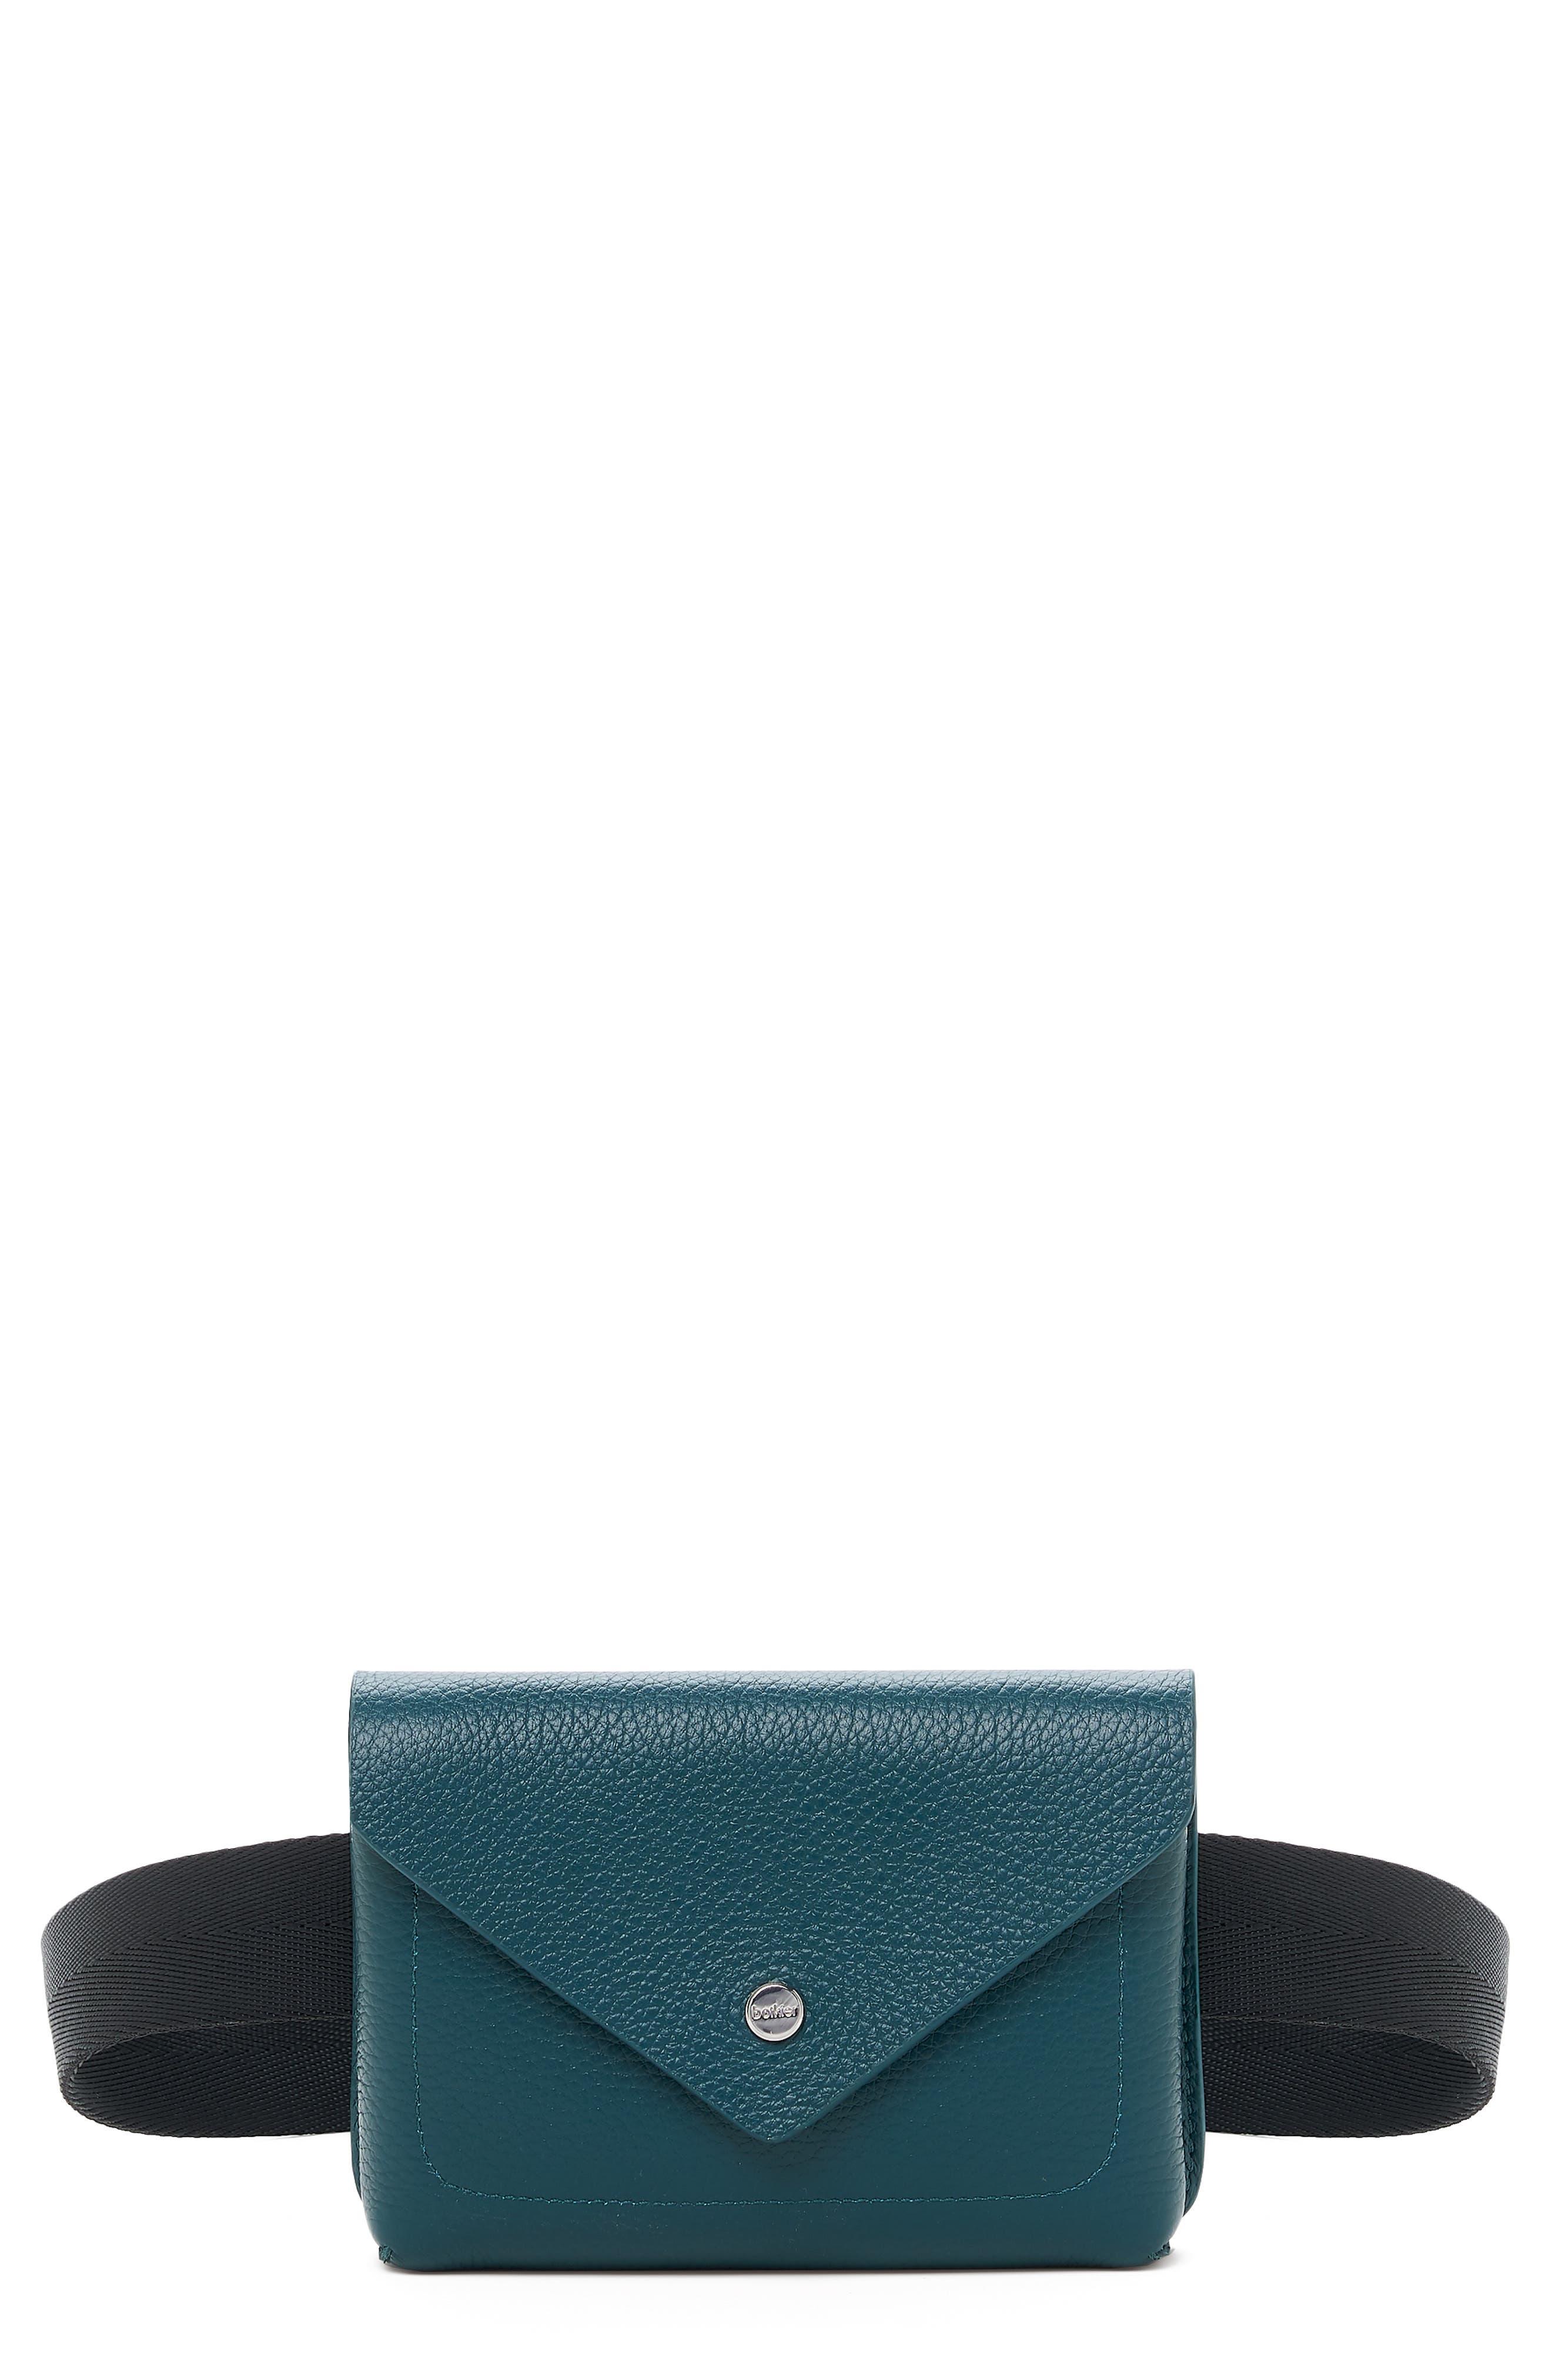 Vivi Calfskin Leather Belt Bag - Green in Emerald